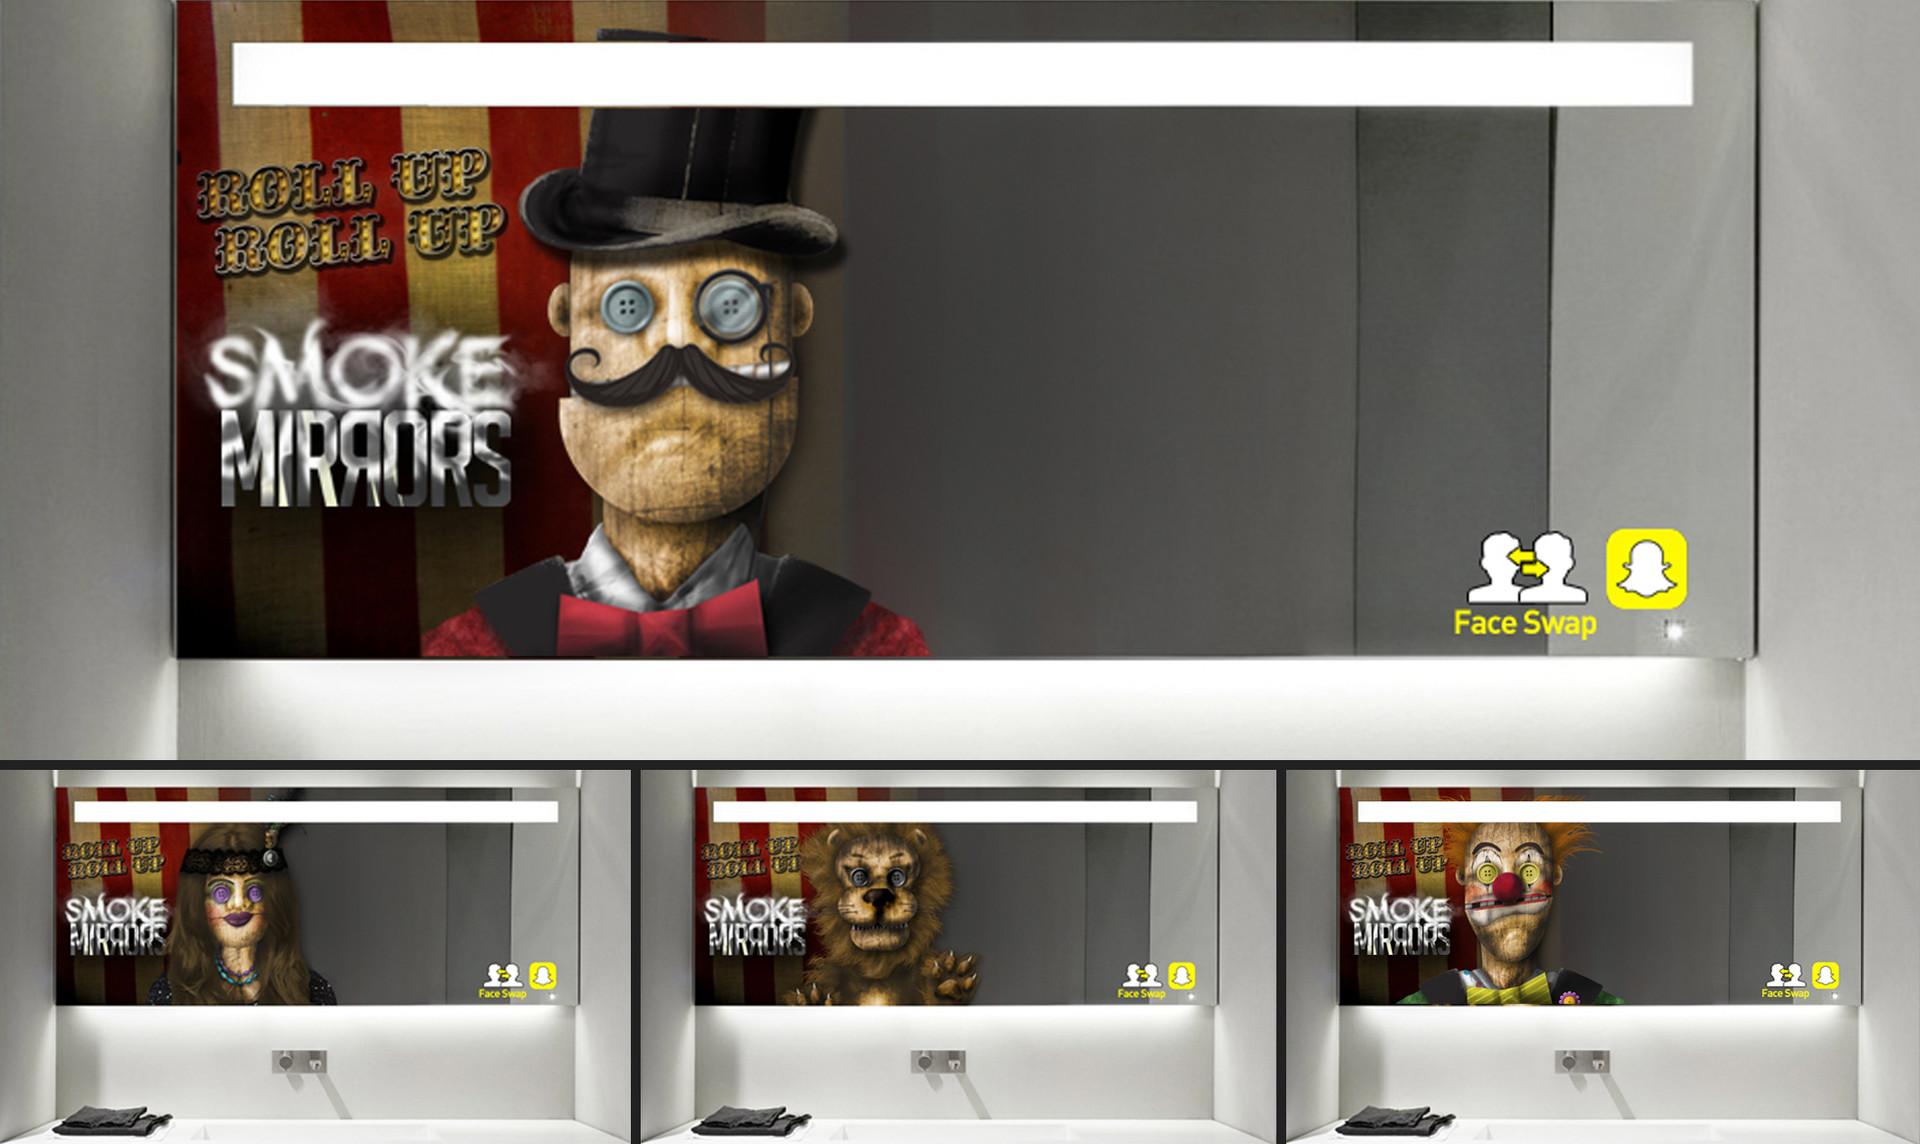 Smoke & Mirrors Face Swap Marketing